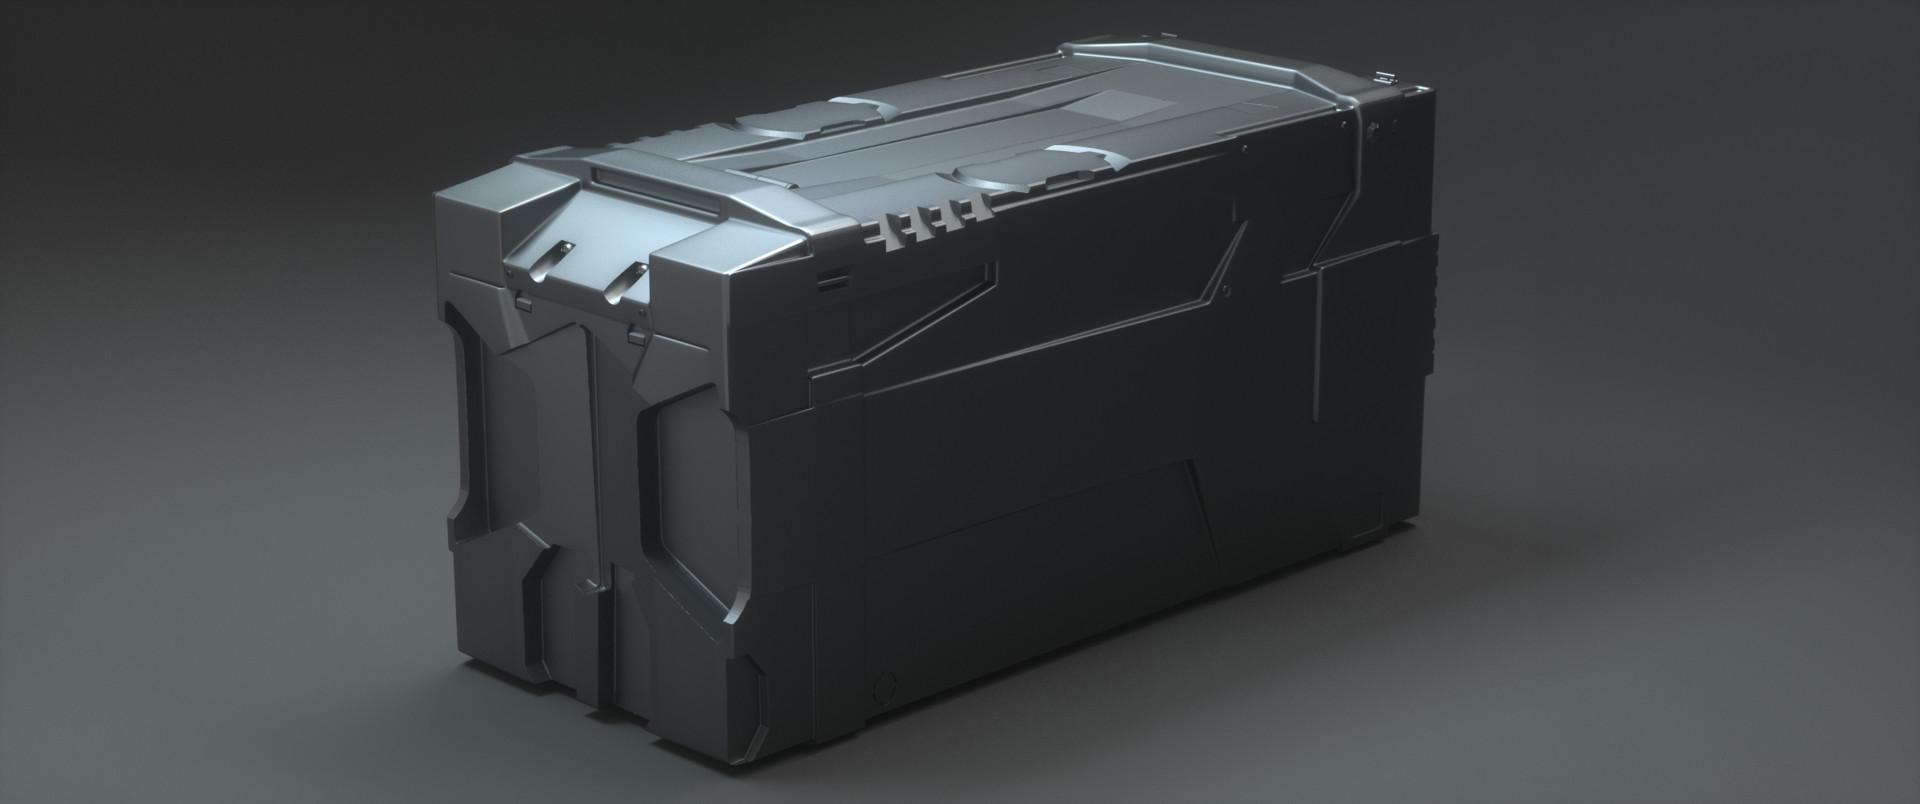 Kresimir jelusic robob3ar 493 breaking the box4